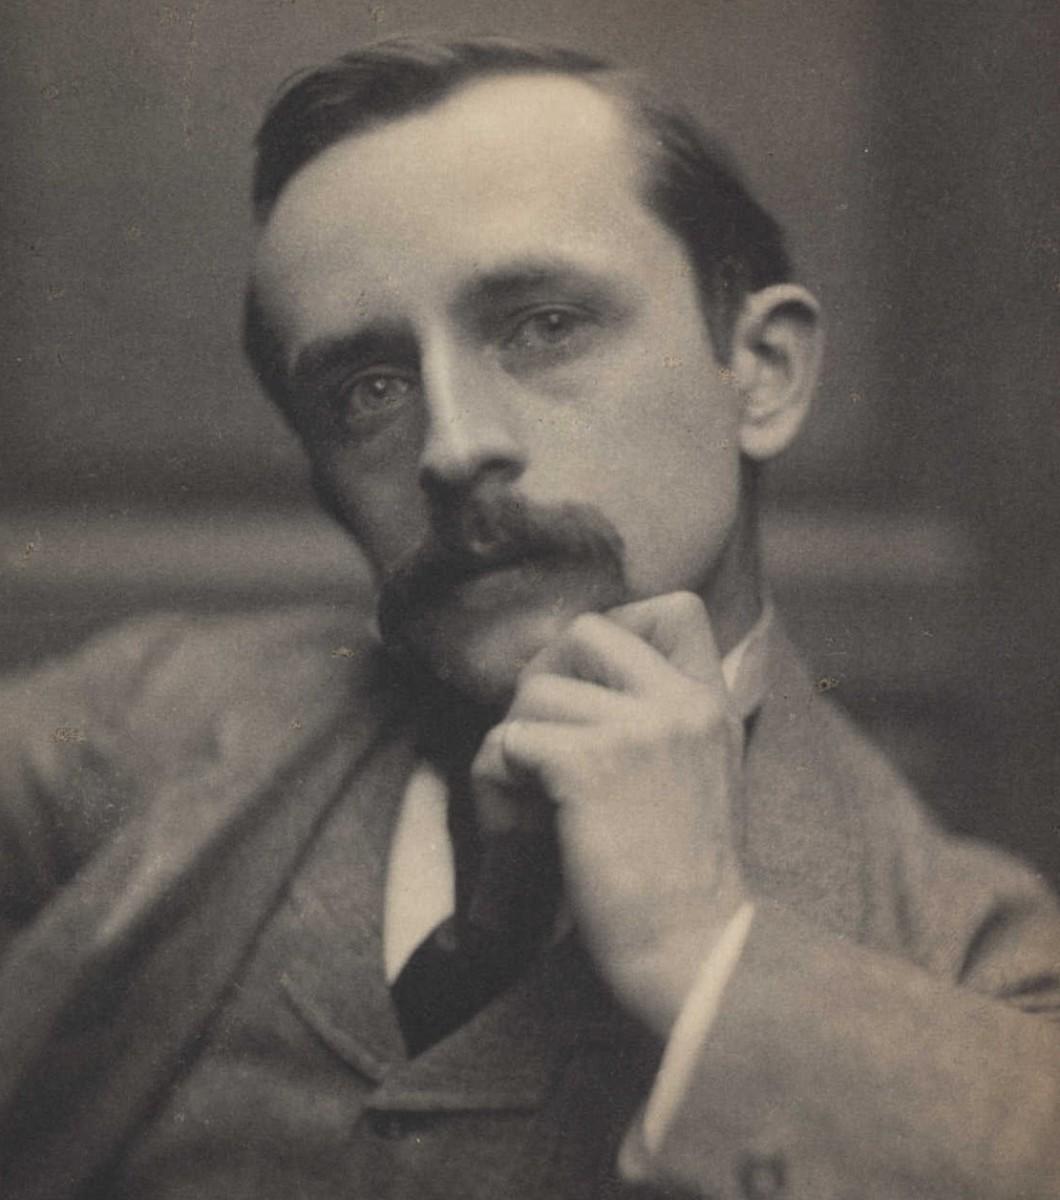 James Matthew Barrie  1860 - 1937